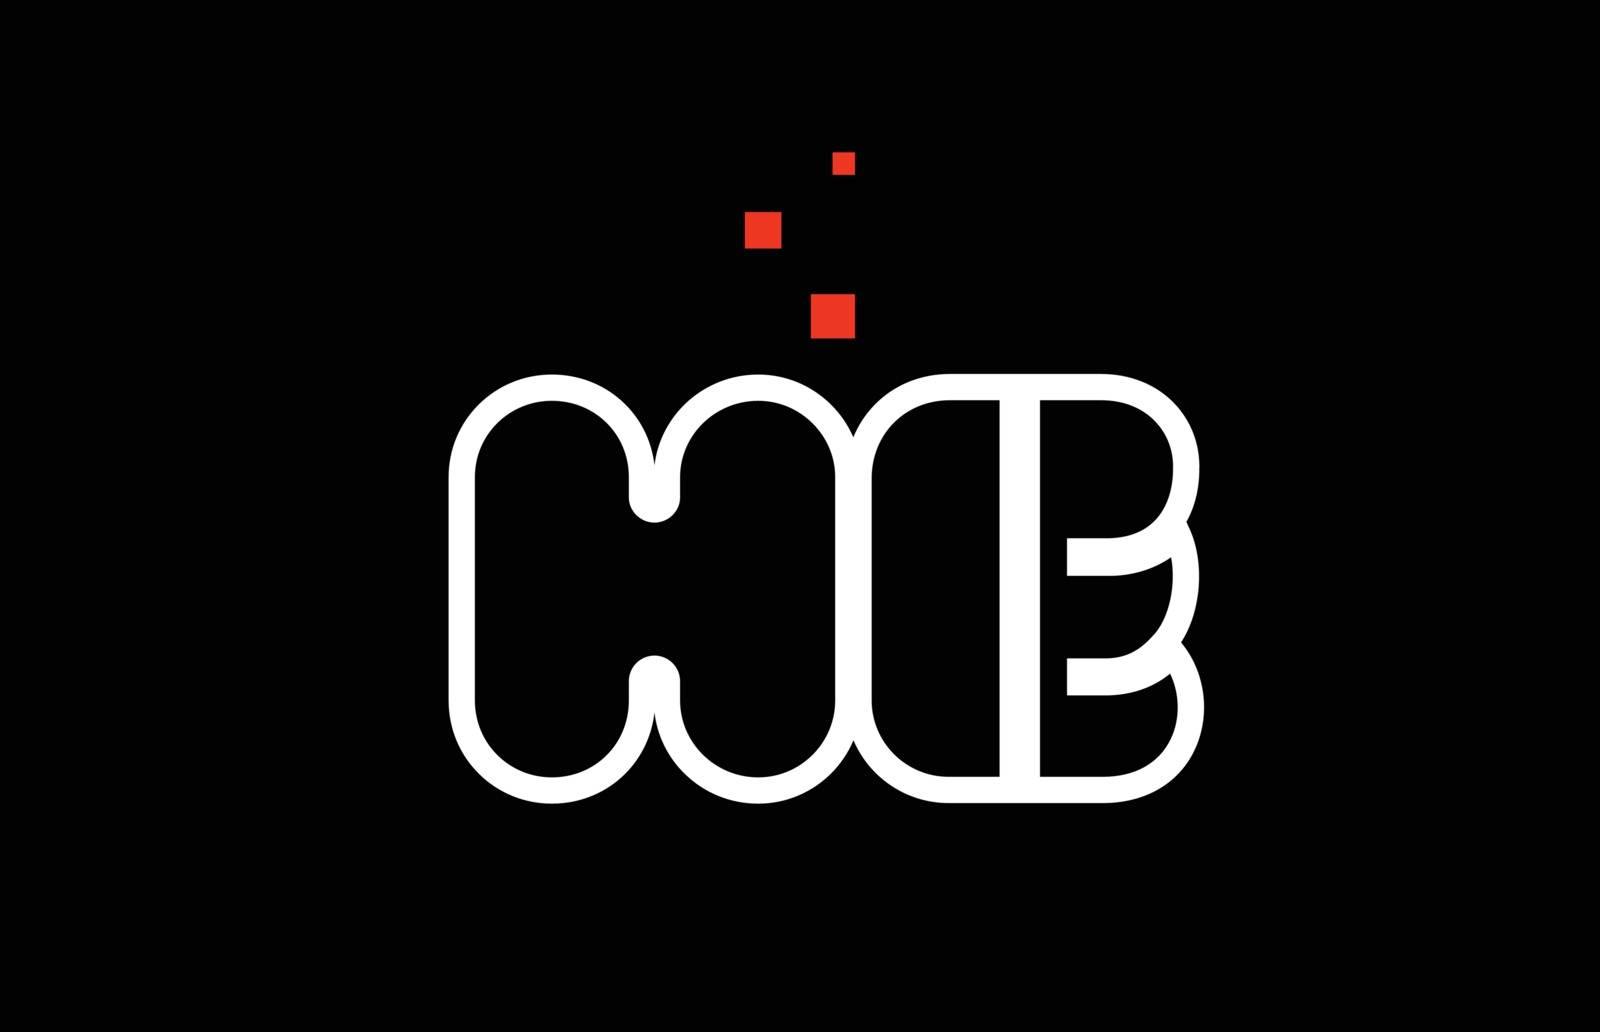 HE H E black white red alphabet letter combination logo icon des by dragomirescu